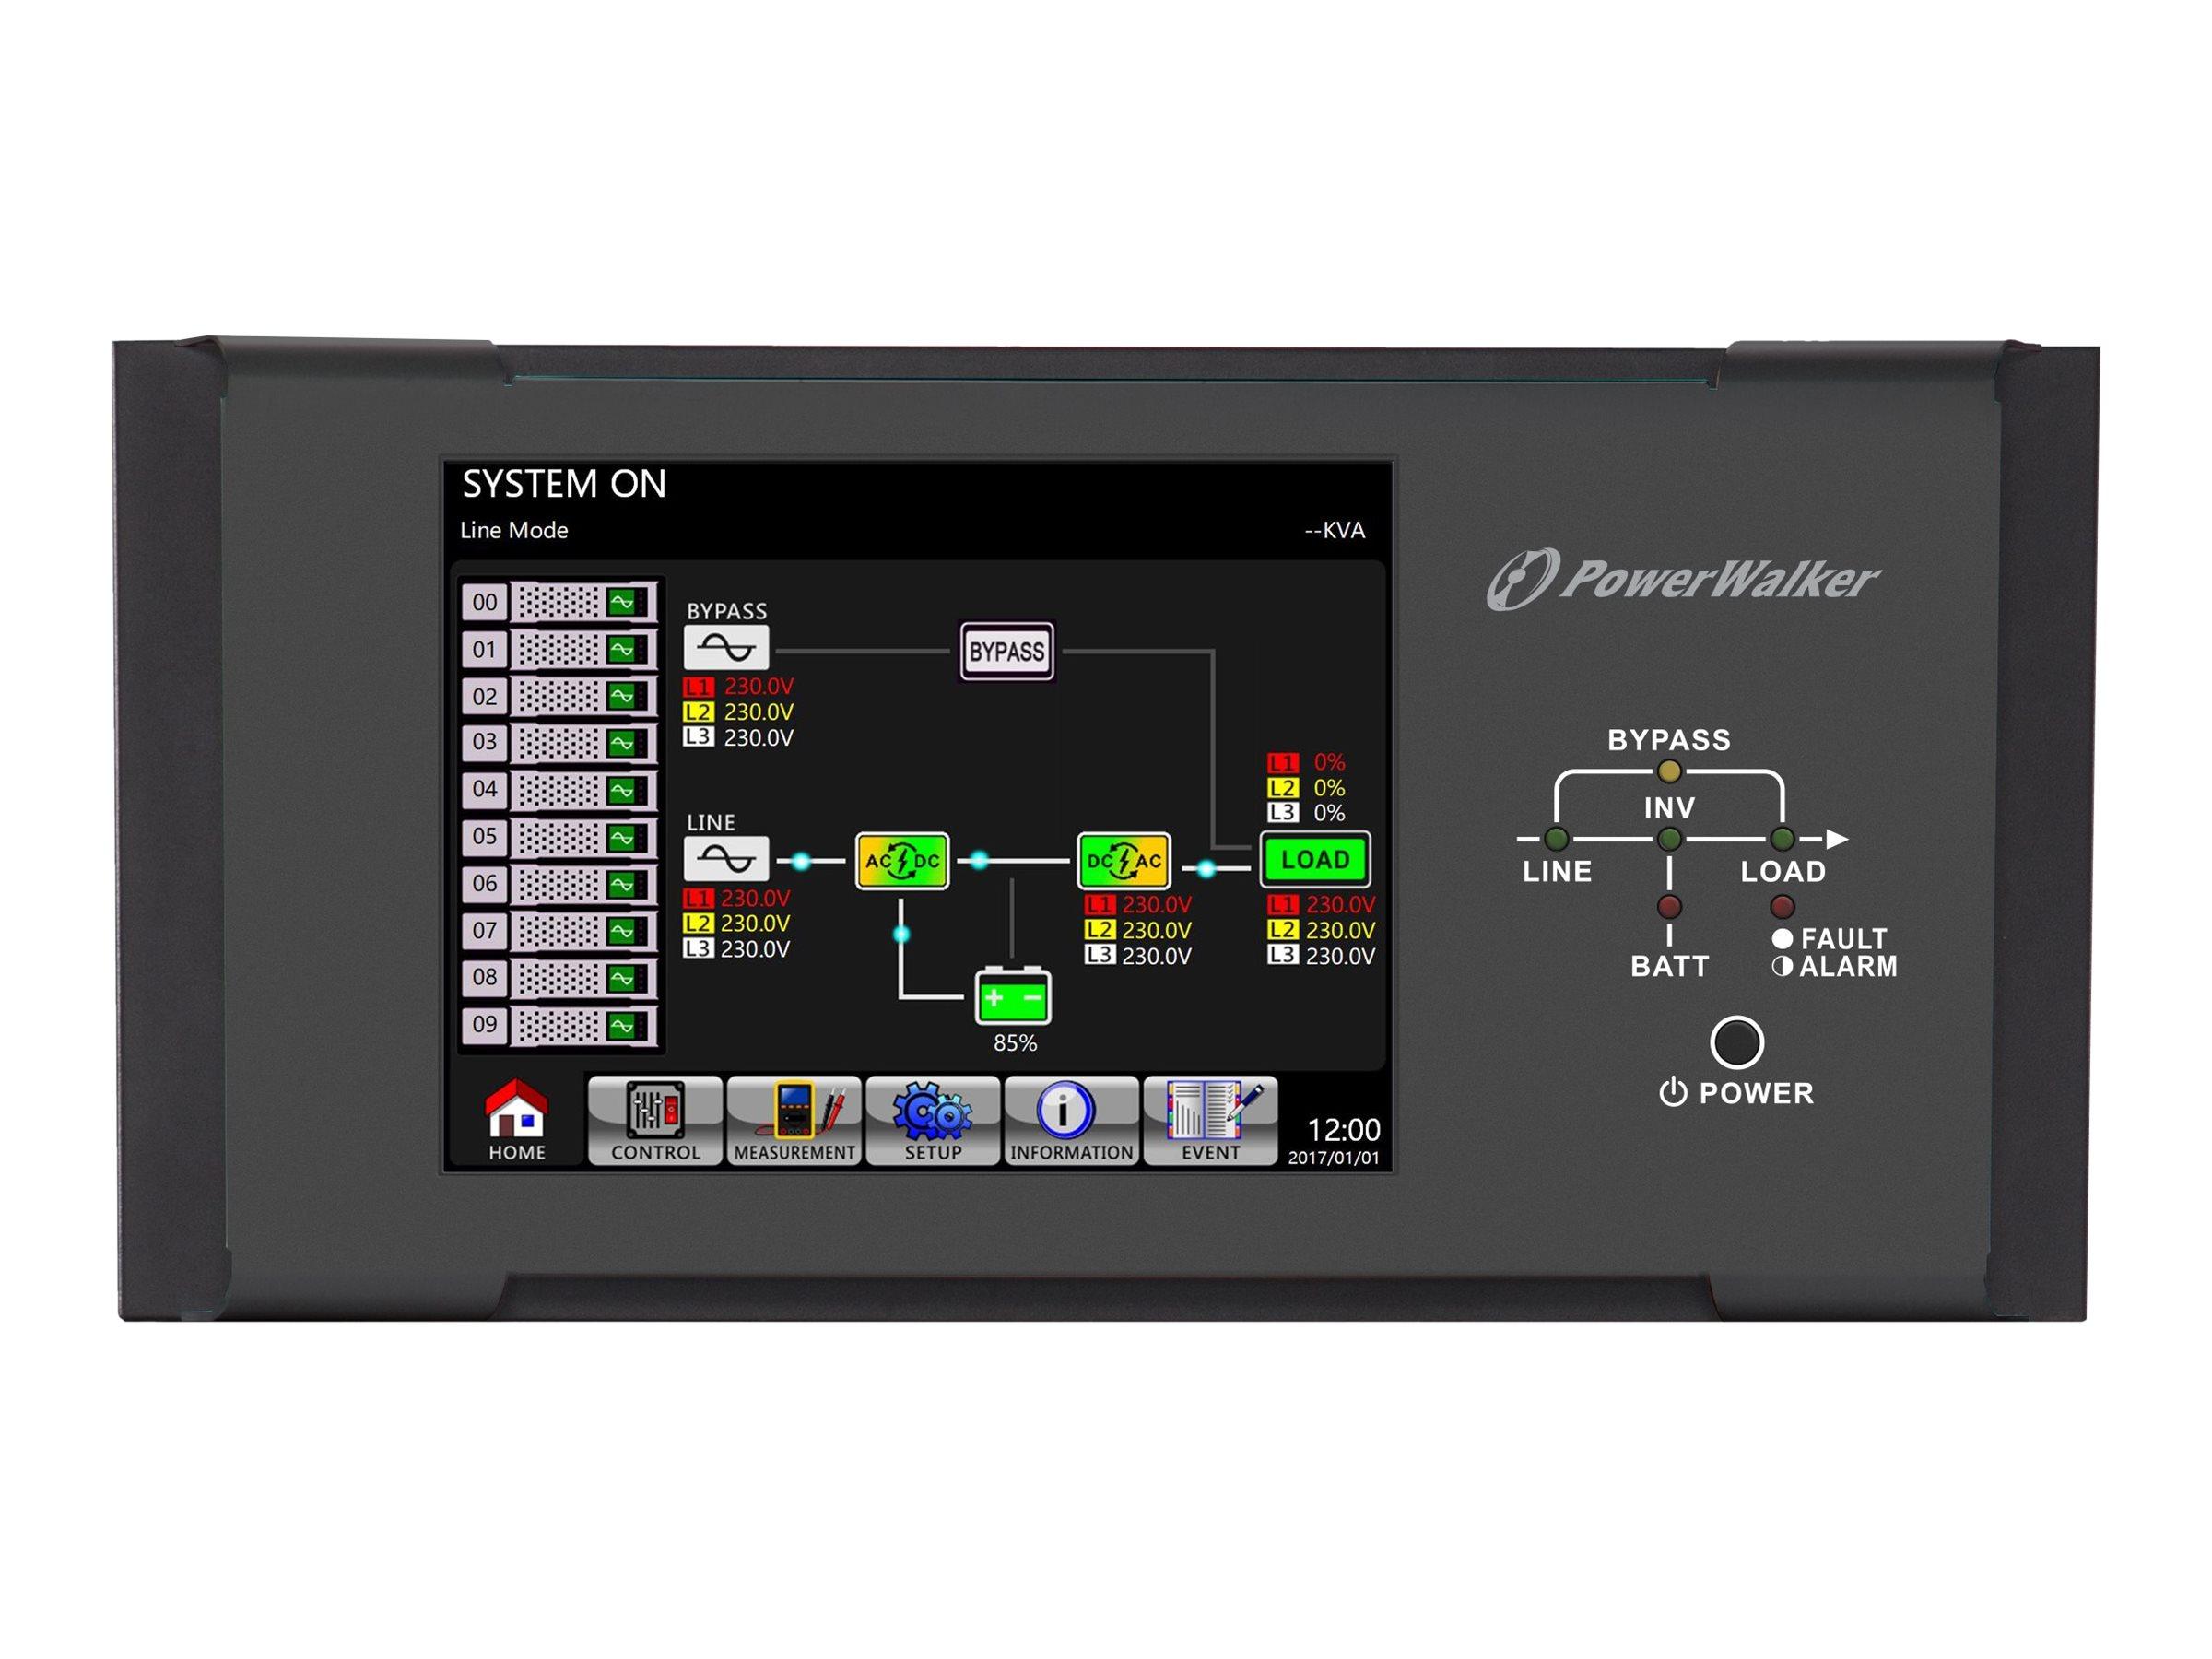 "Bluewalker PowerWalker - LCD Anzeige - Gestell - 25.4 cm (10"")"